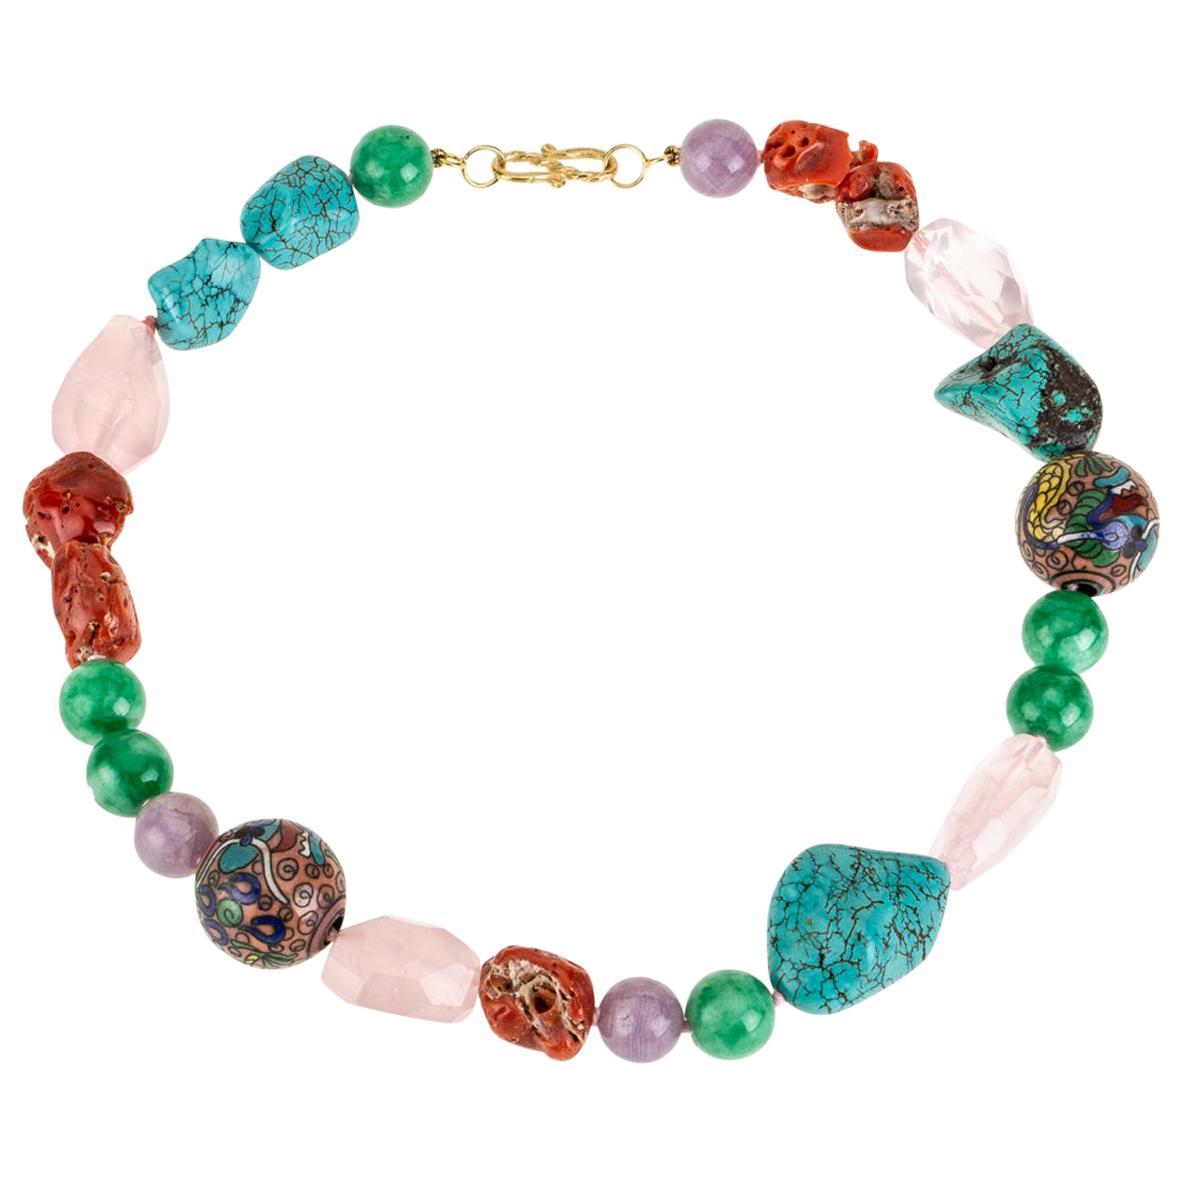 Coral Turquoise Jade Necklace 18 Karat Gold